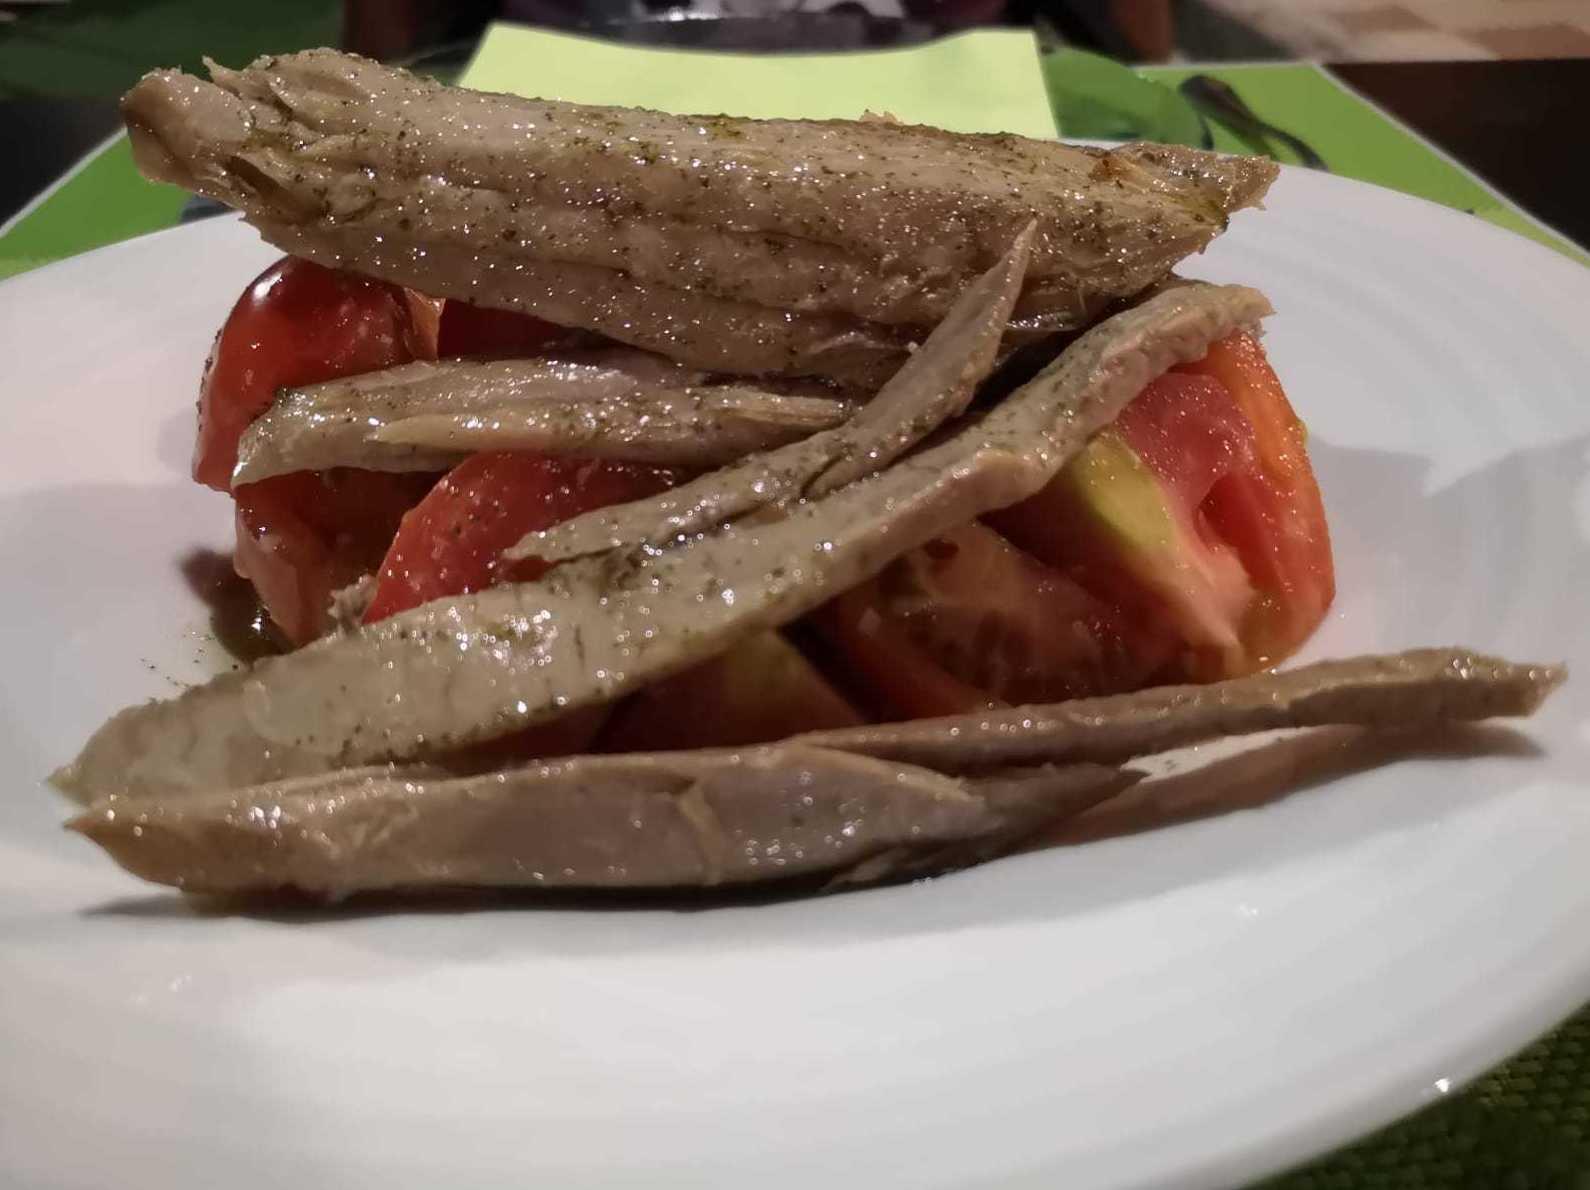 nido de tomate con ventrresca